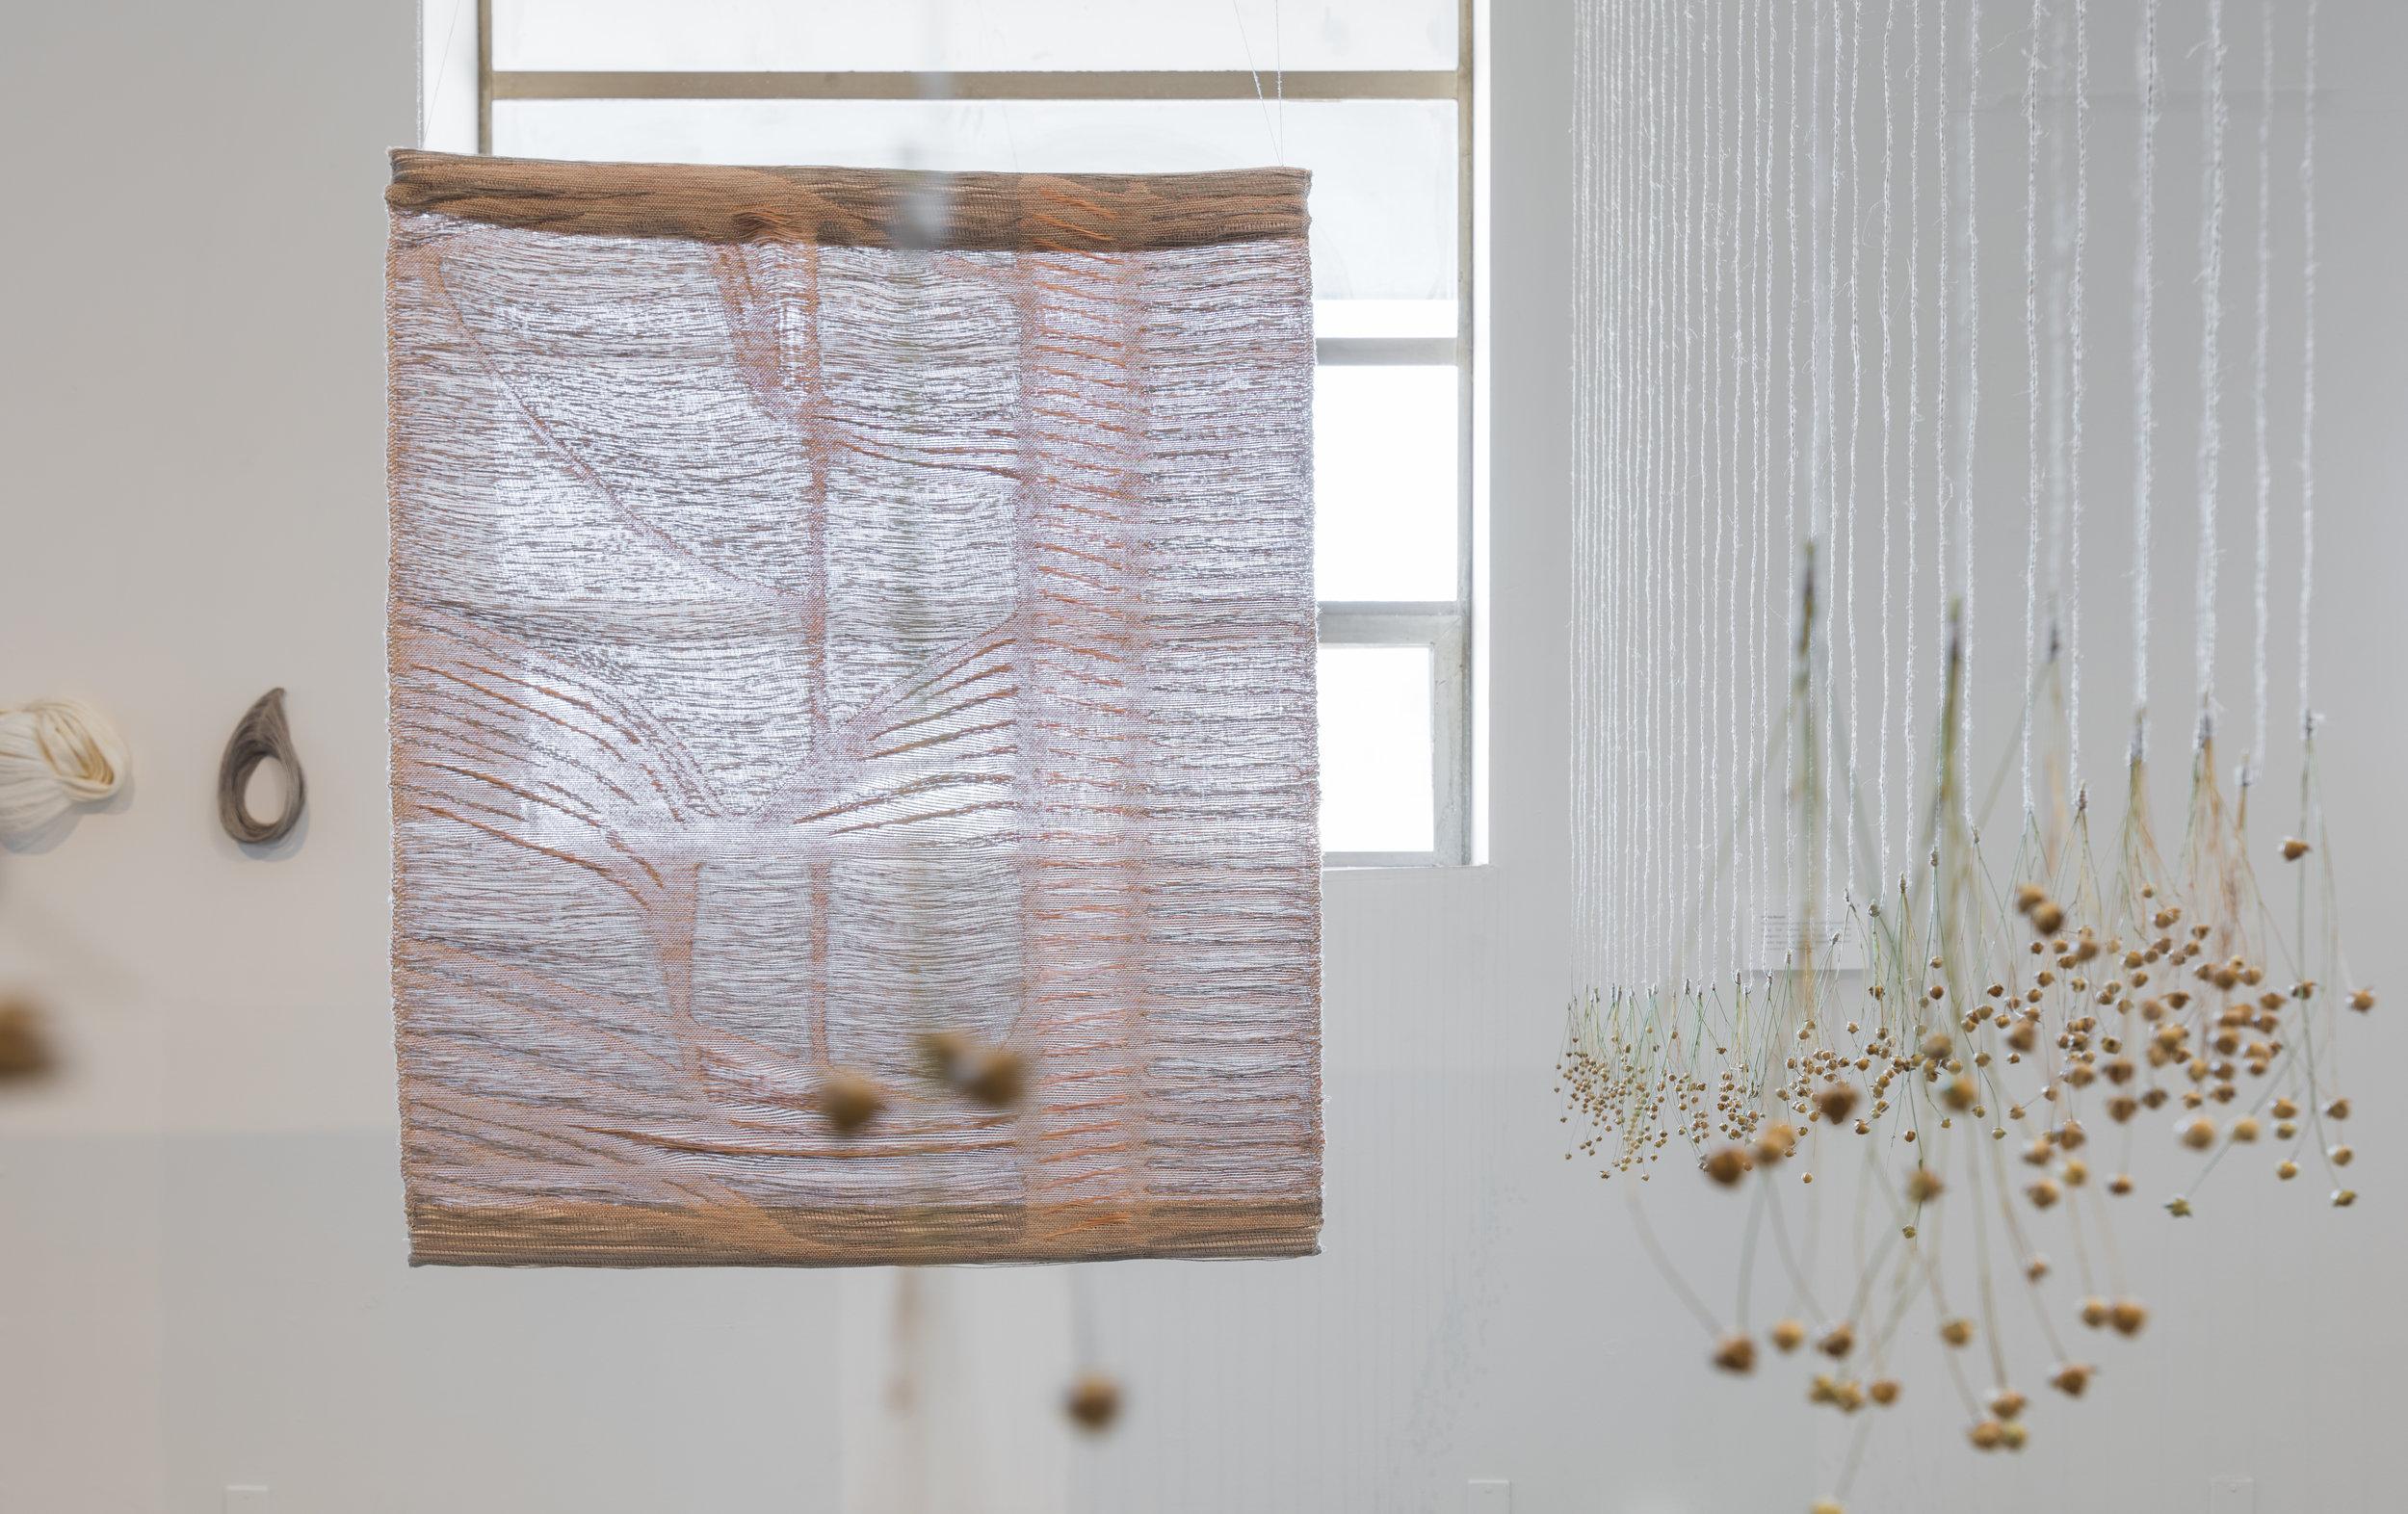 tc2 digital jacquard weaving: linen weft